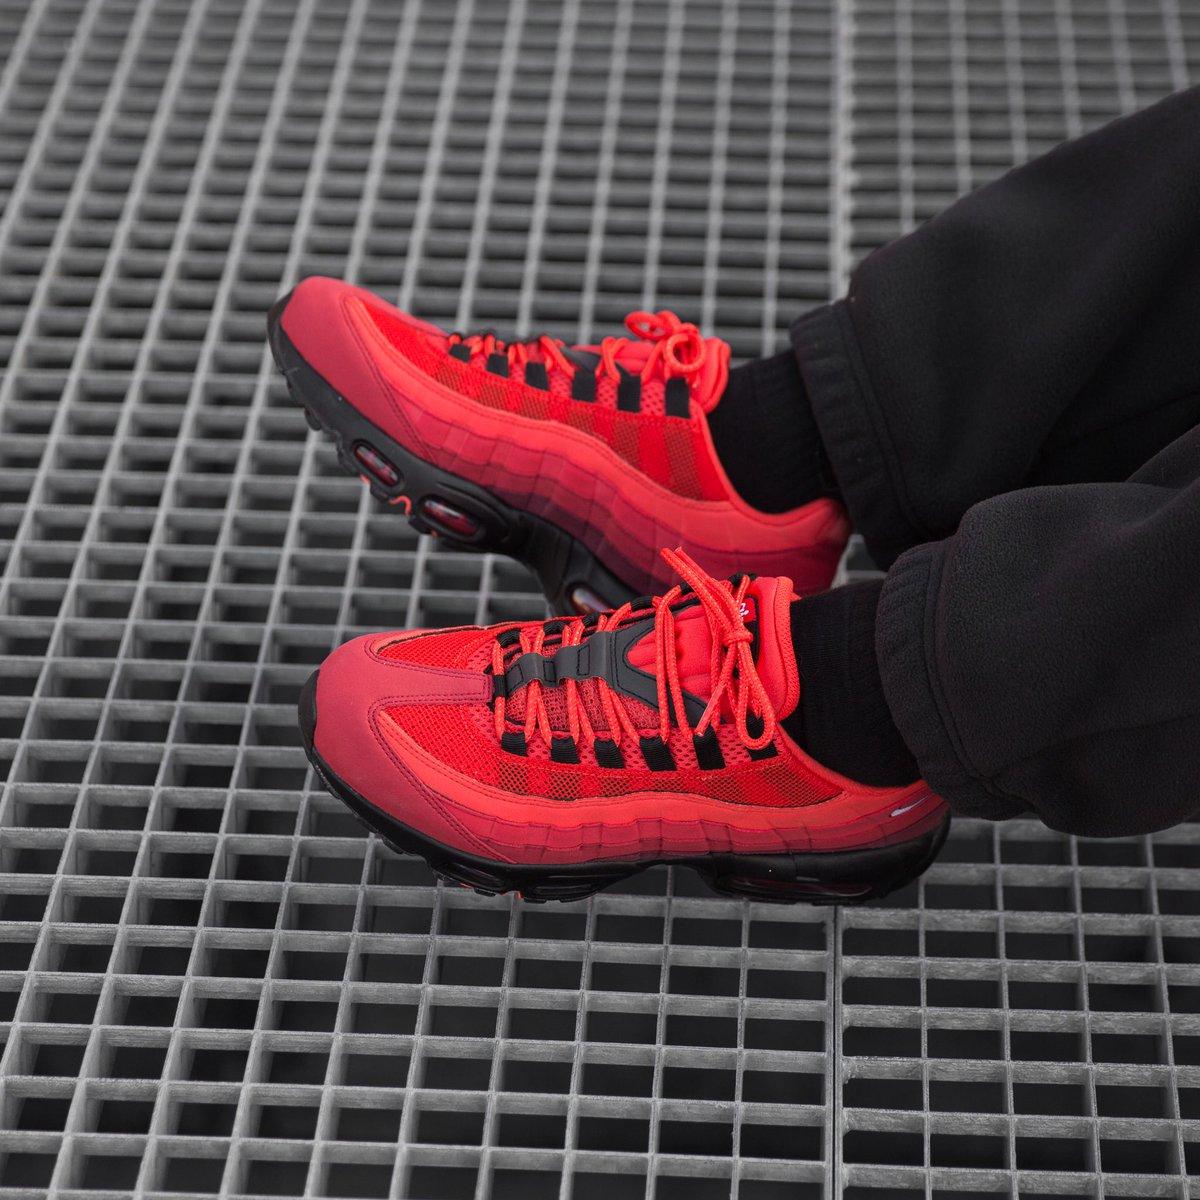 Nike Air Max 95 Og - Habanero Red